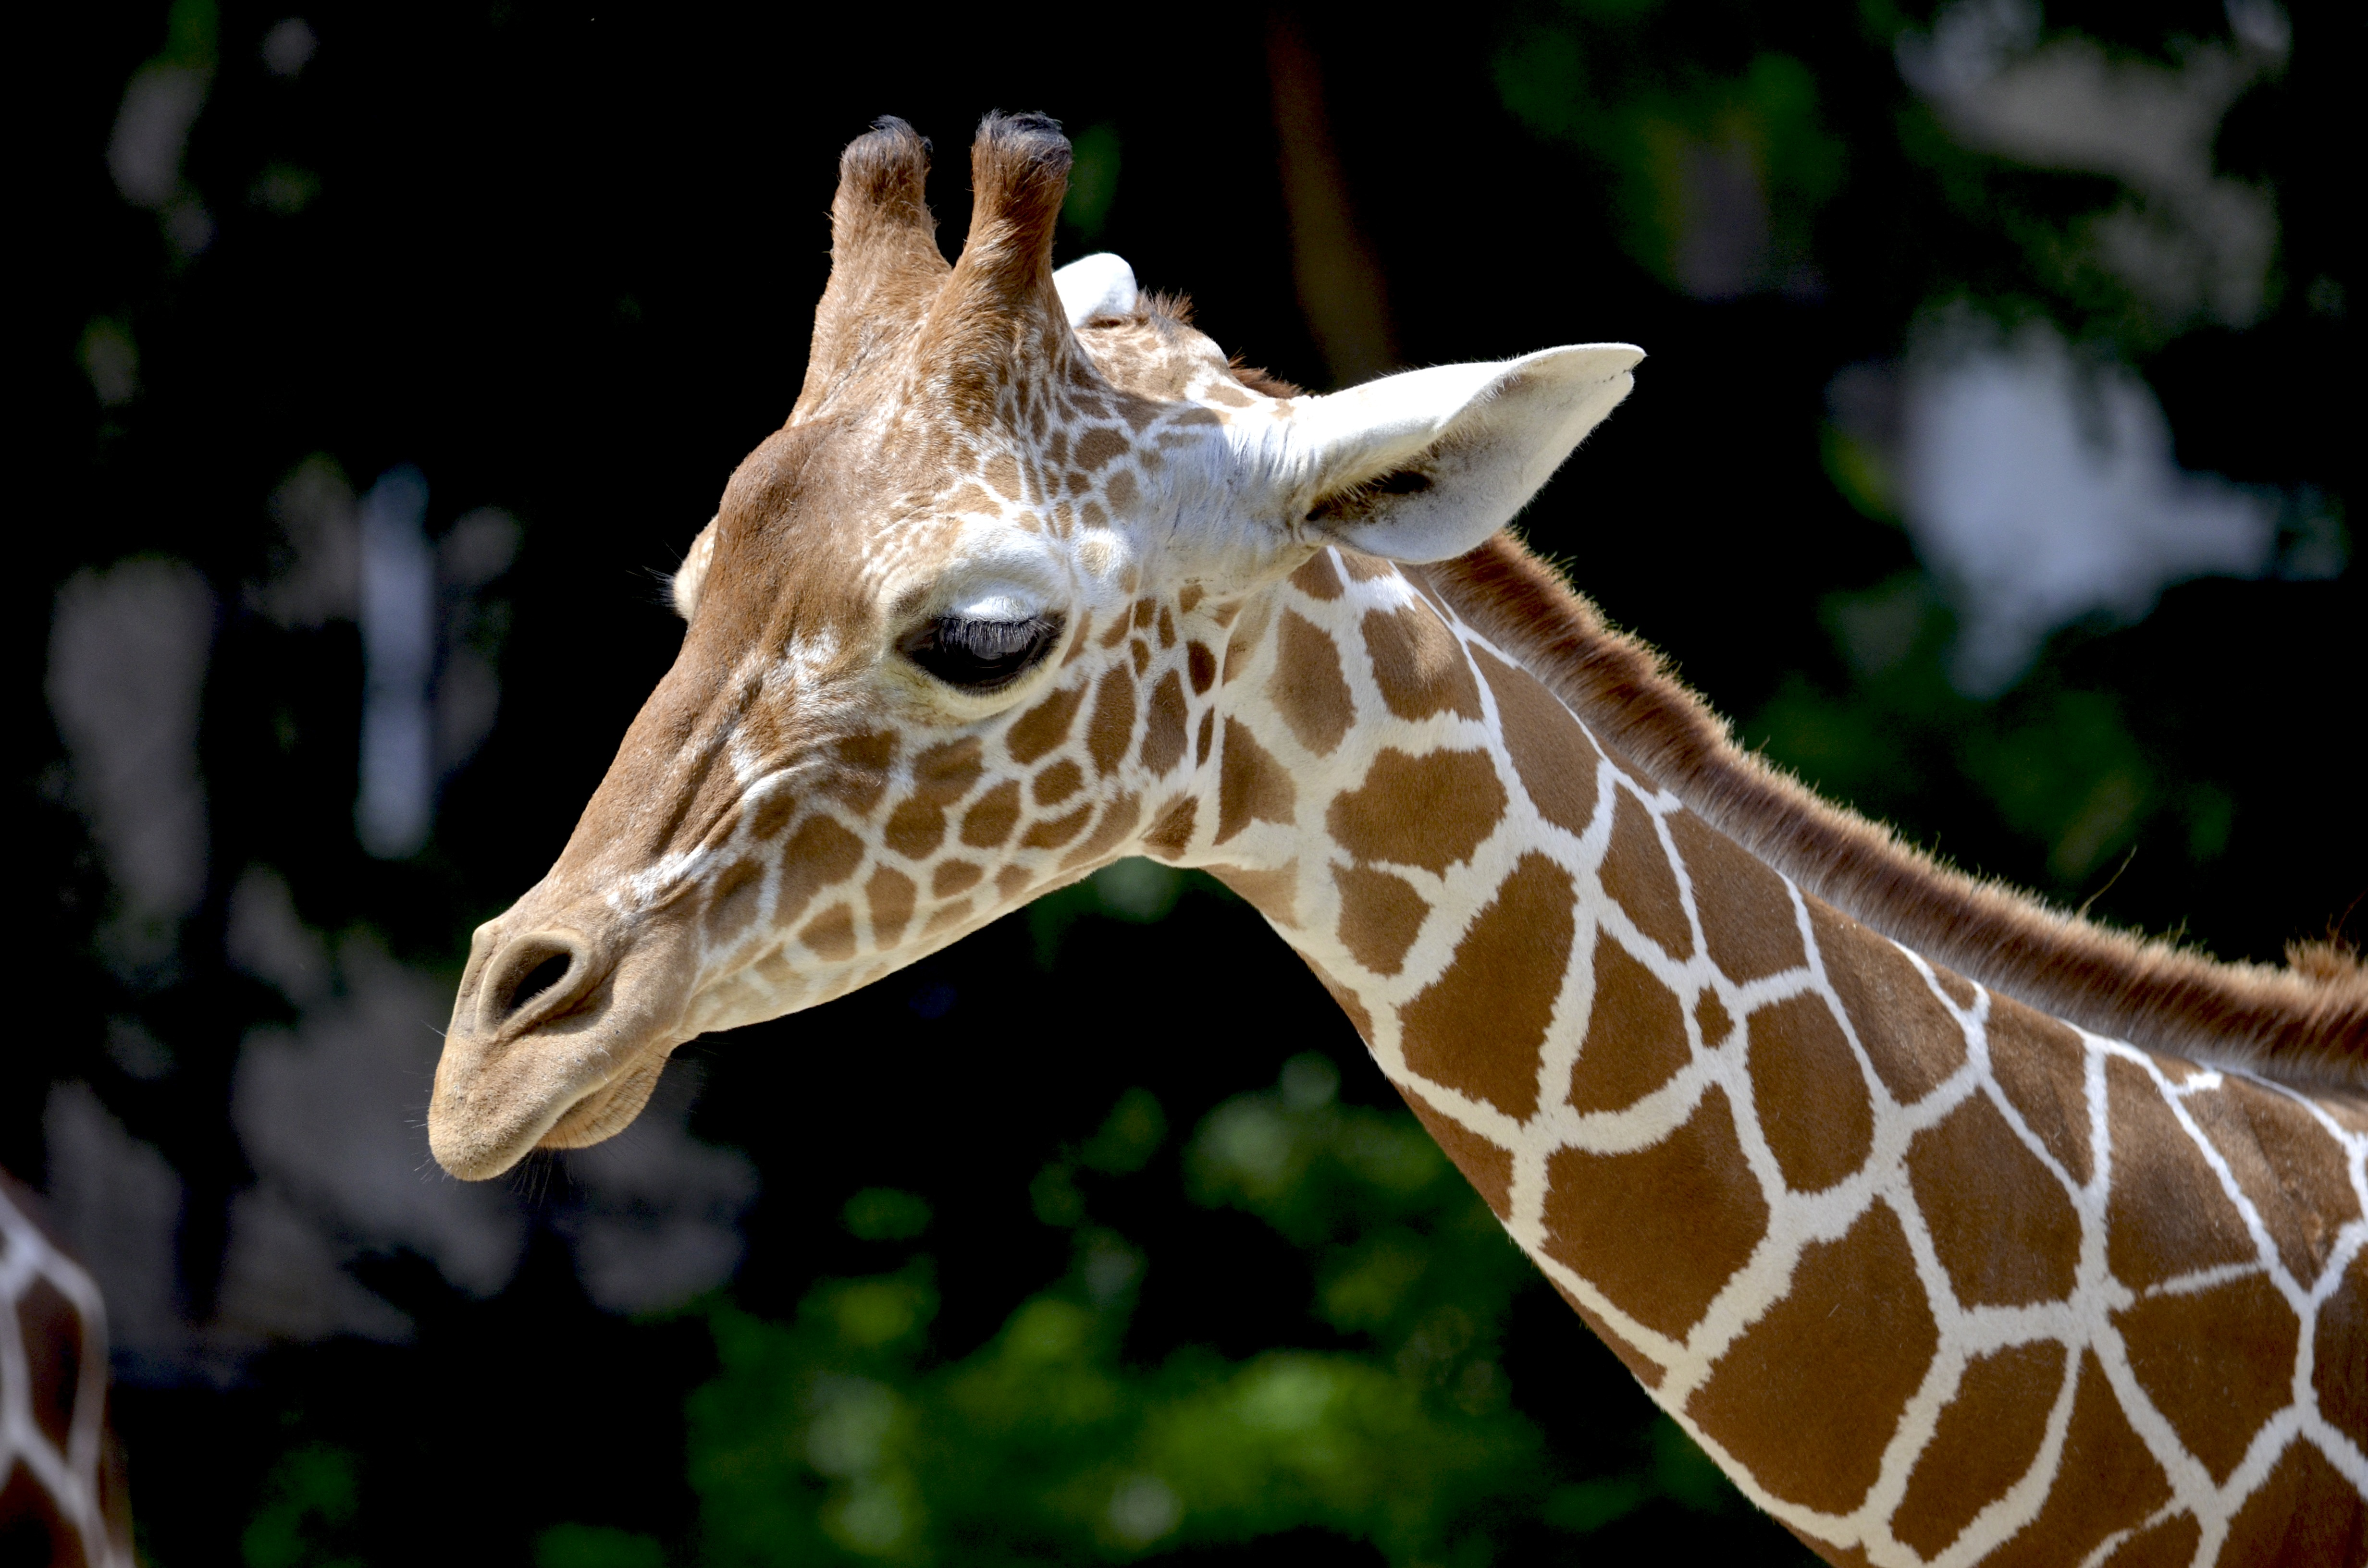 Cute Animals Desktop Wallpapers Brown Giraffe During Daytime 183 Free Stock Photo